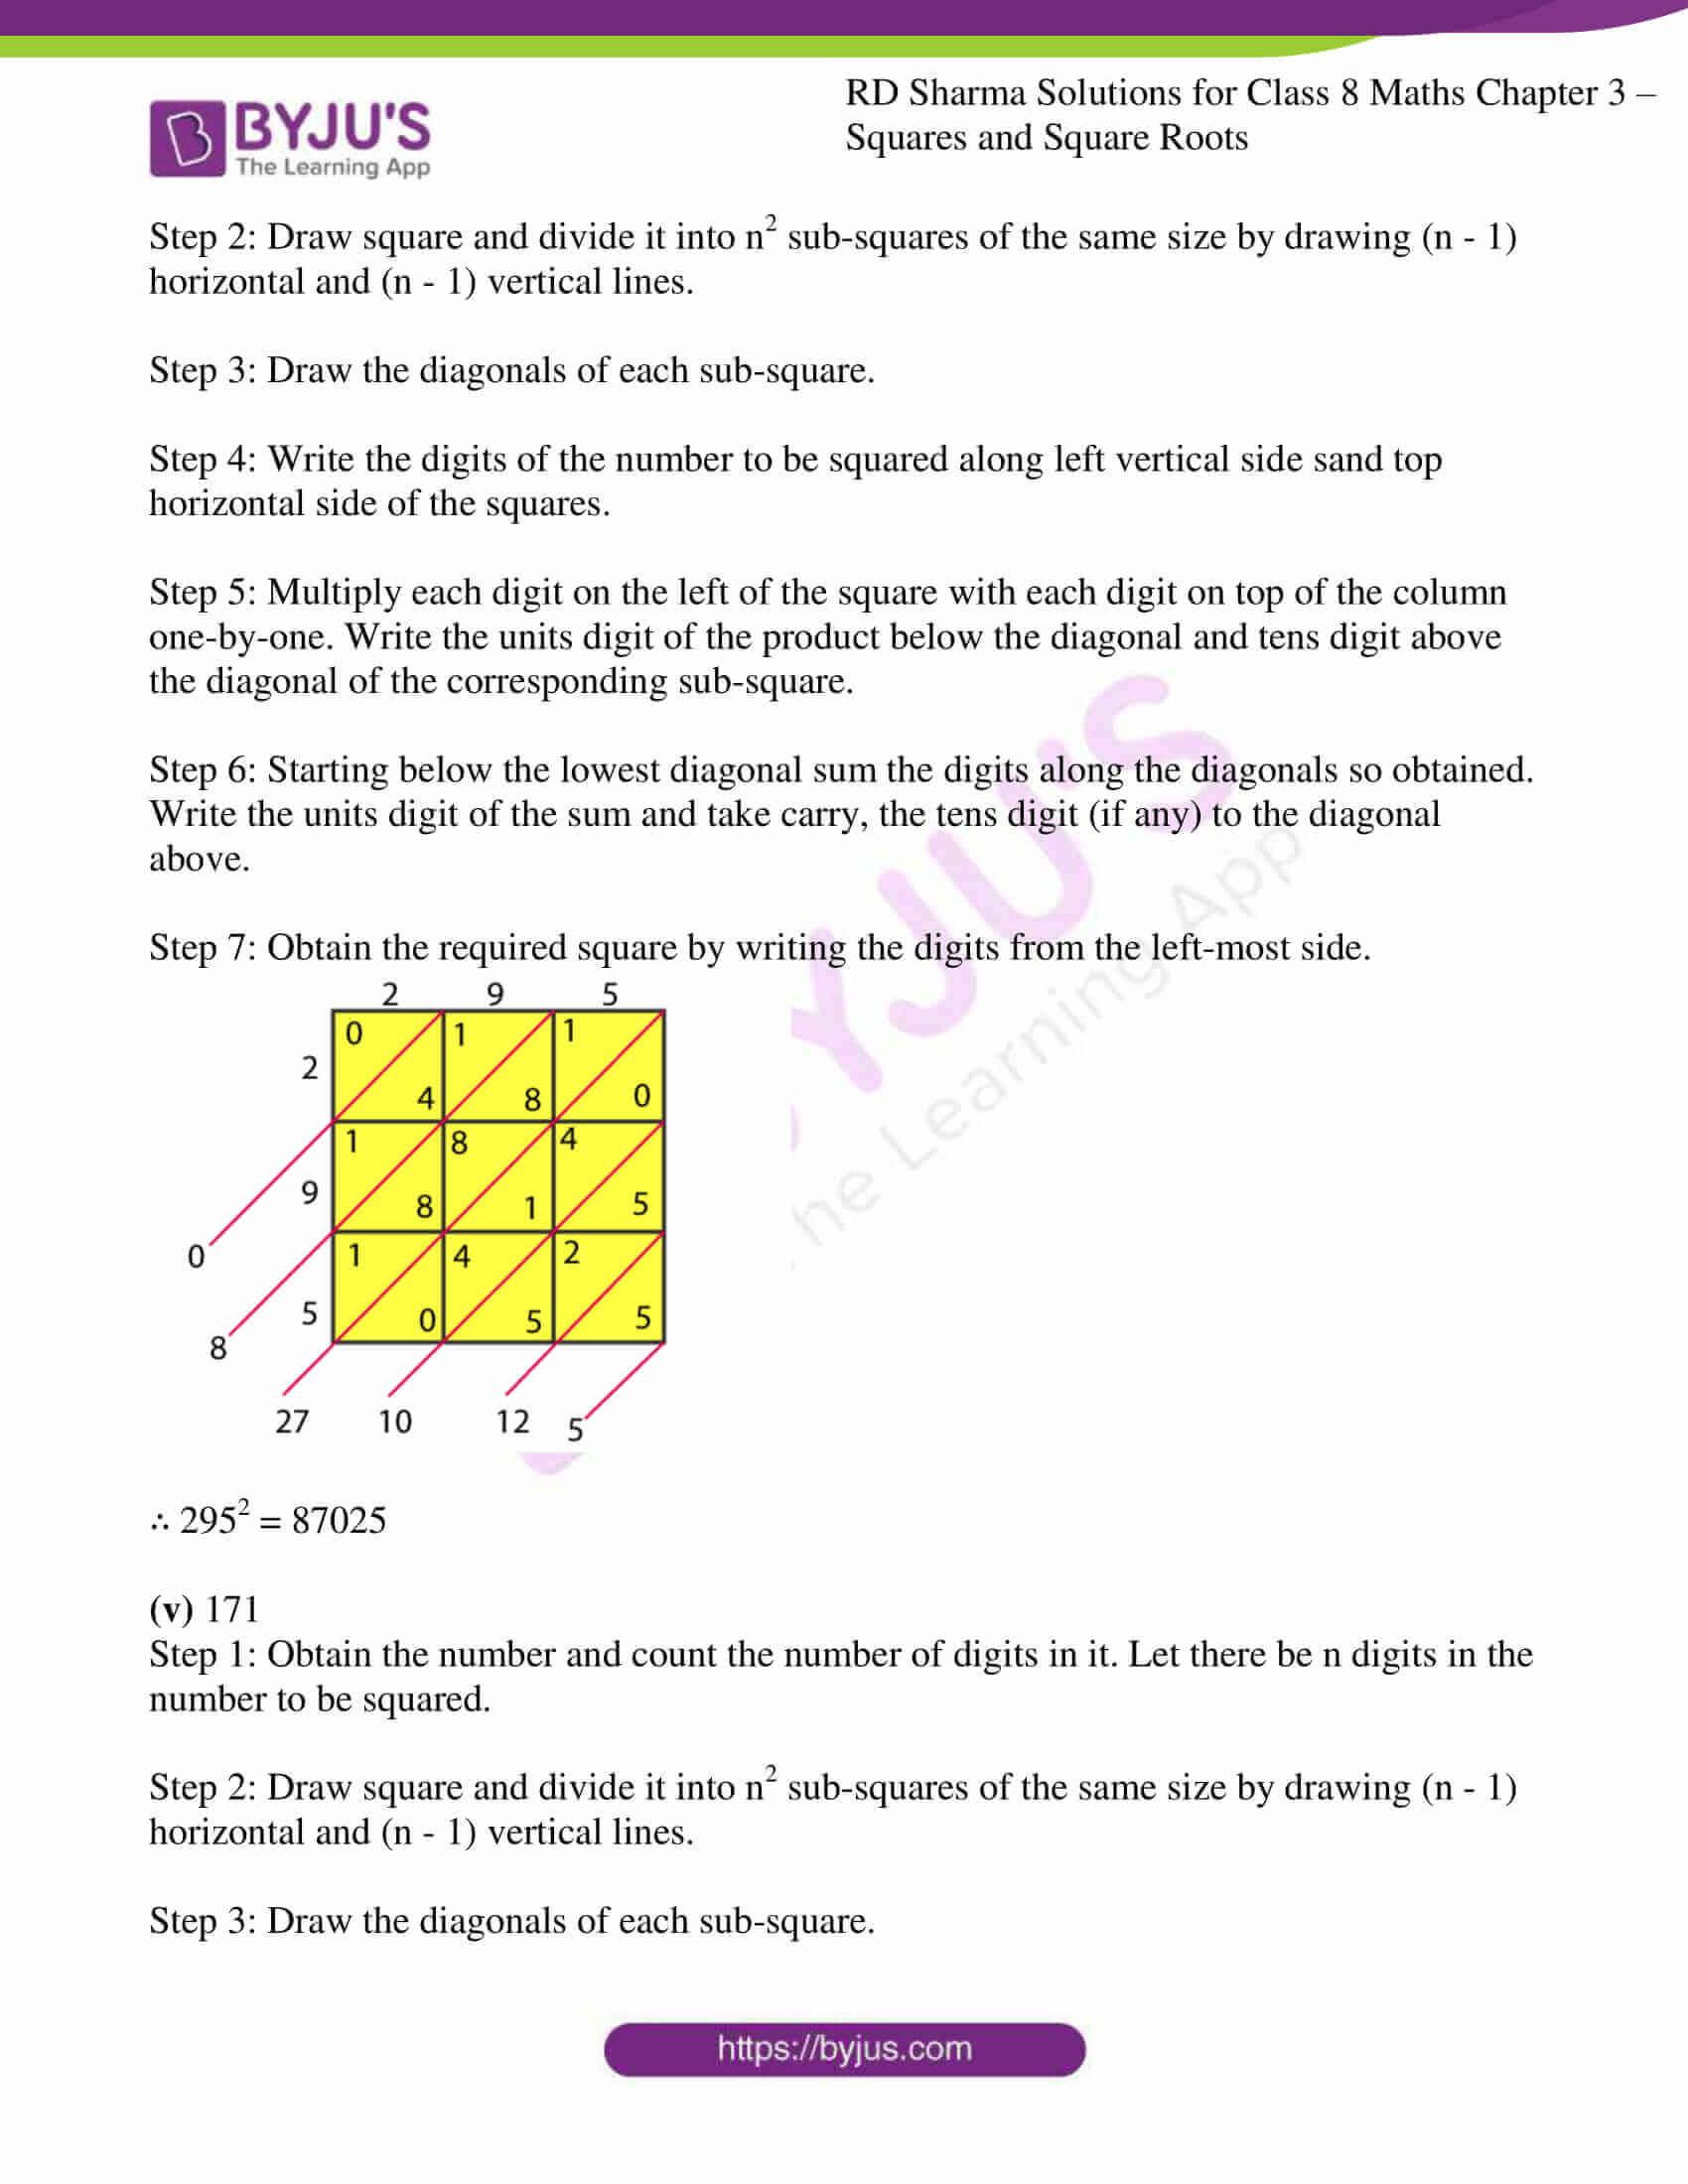 rd sharma class 8 maths chapter 3 exercise 3 06